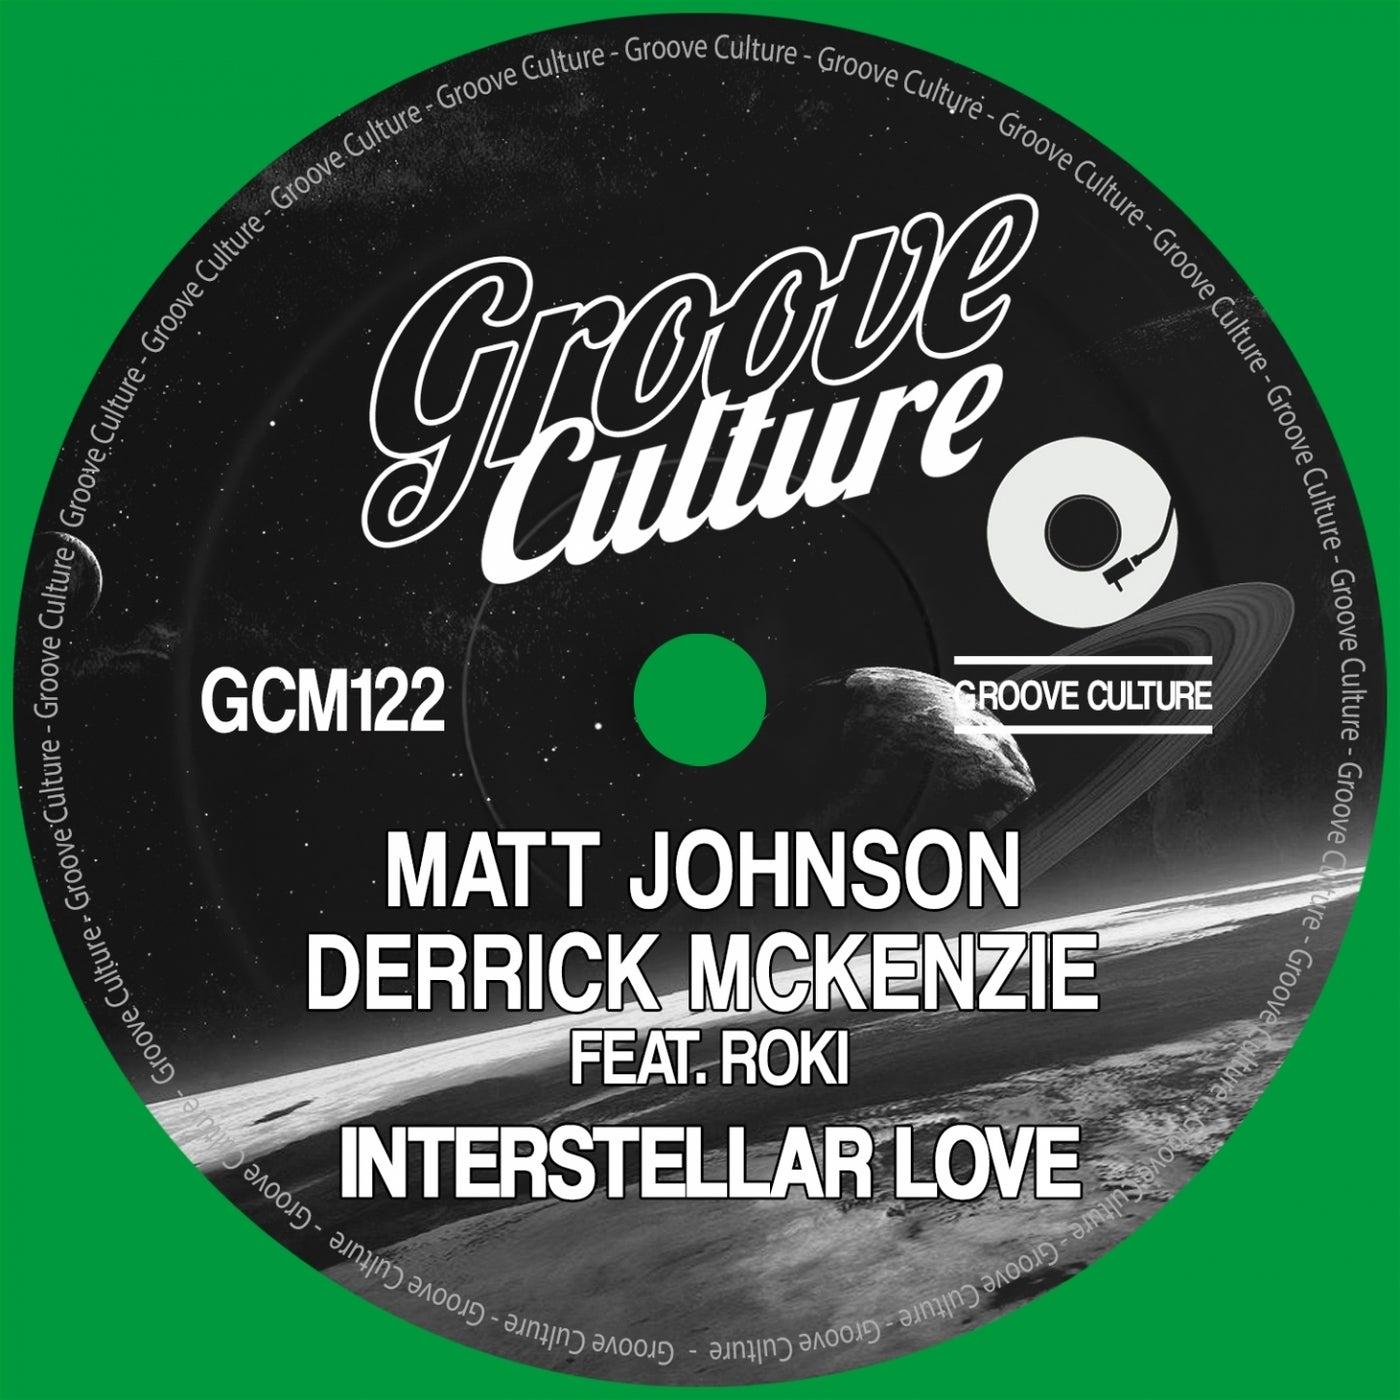 Interstellar Love feat. Roki (Extended Mix)